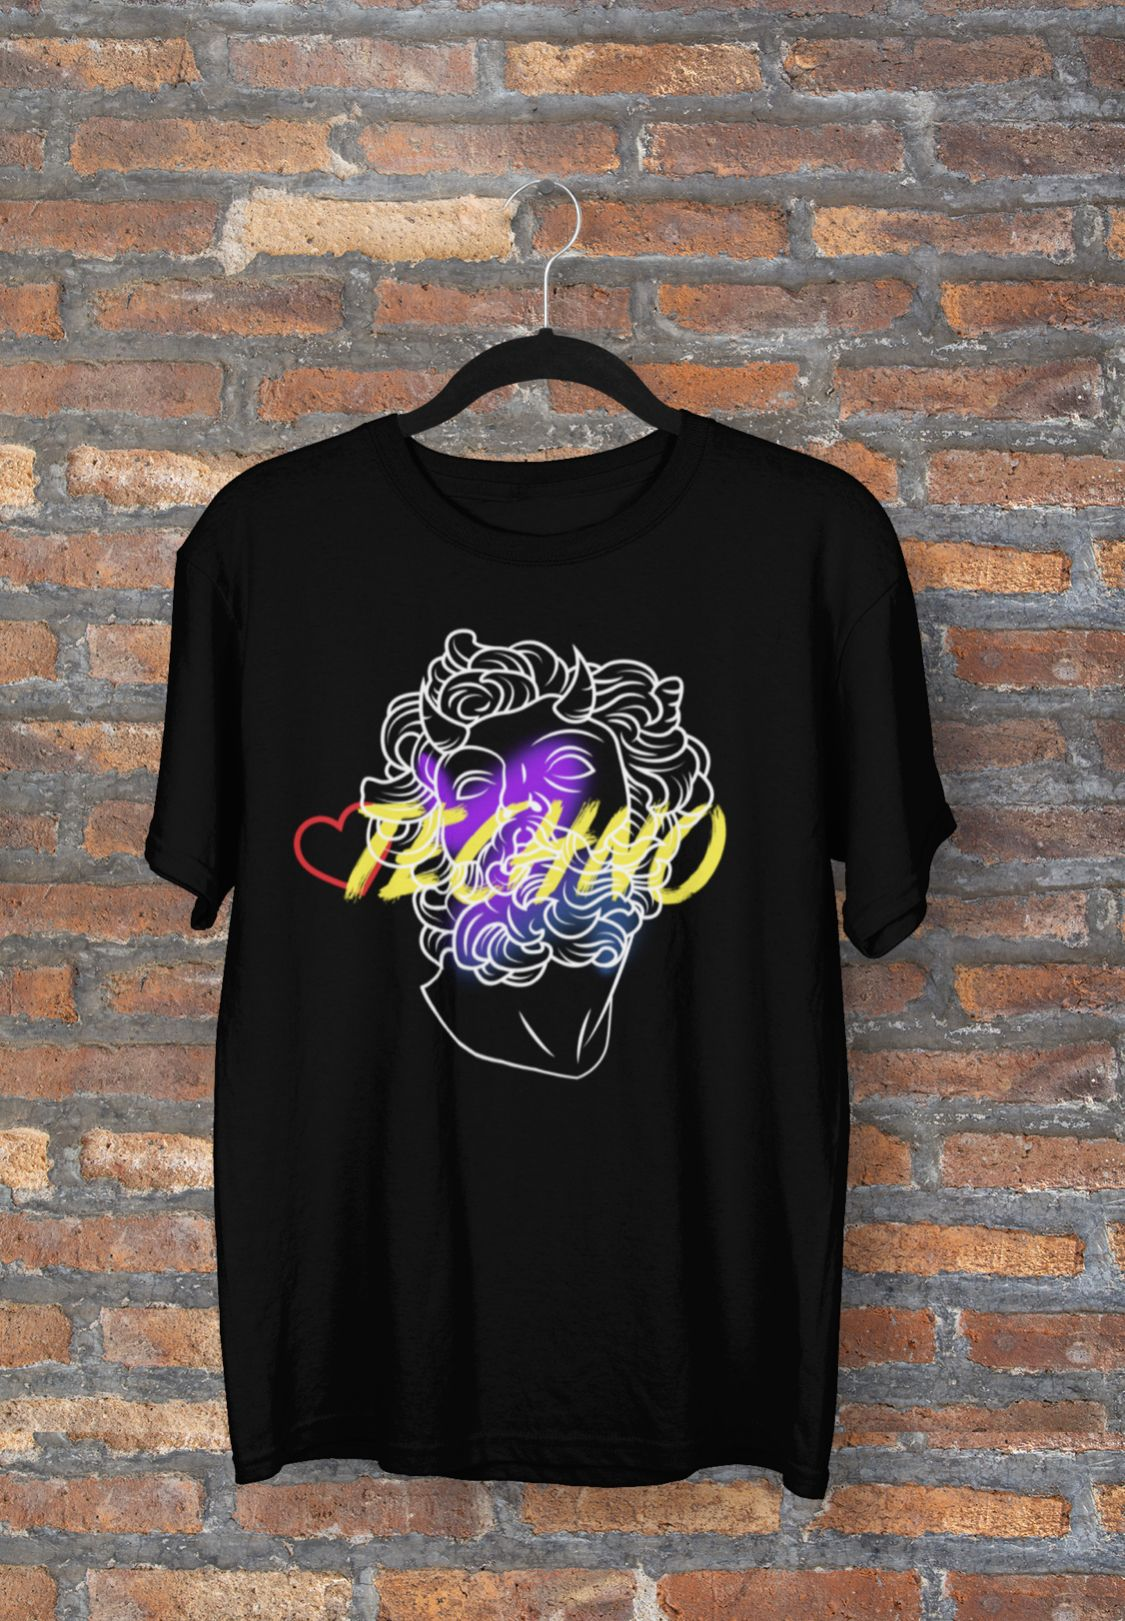 #techno #technomusic #tshirt #festival #god